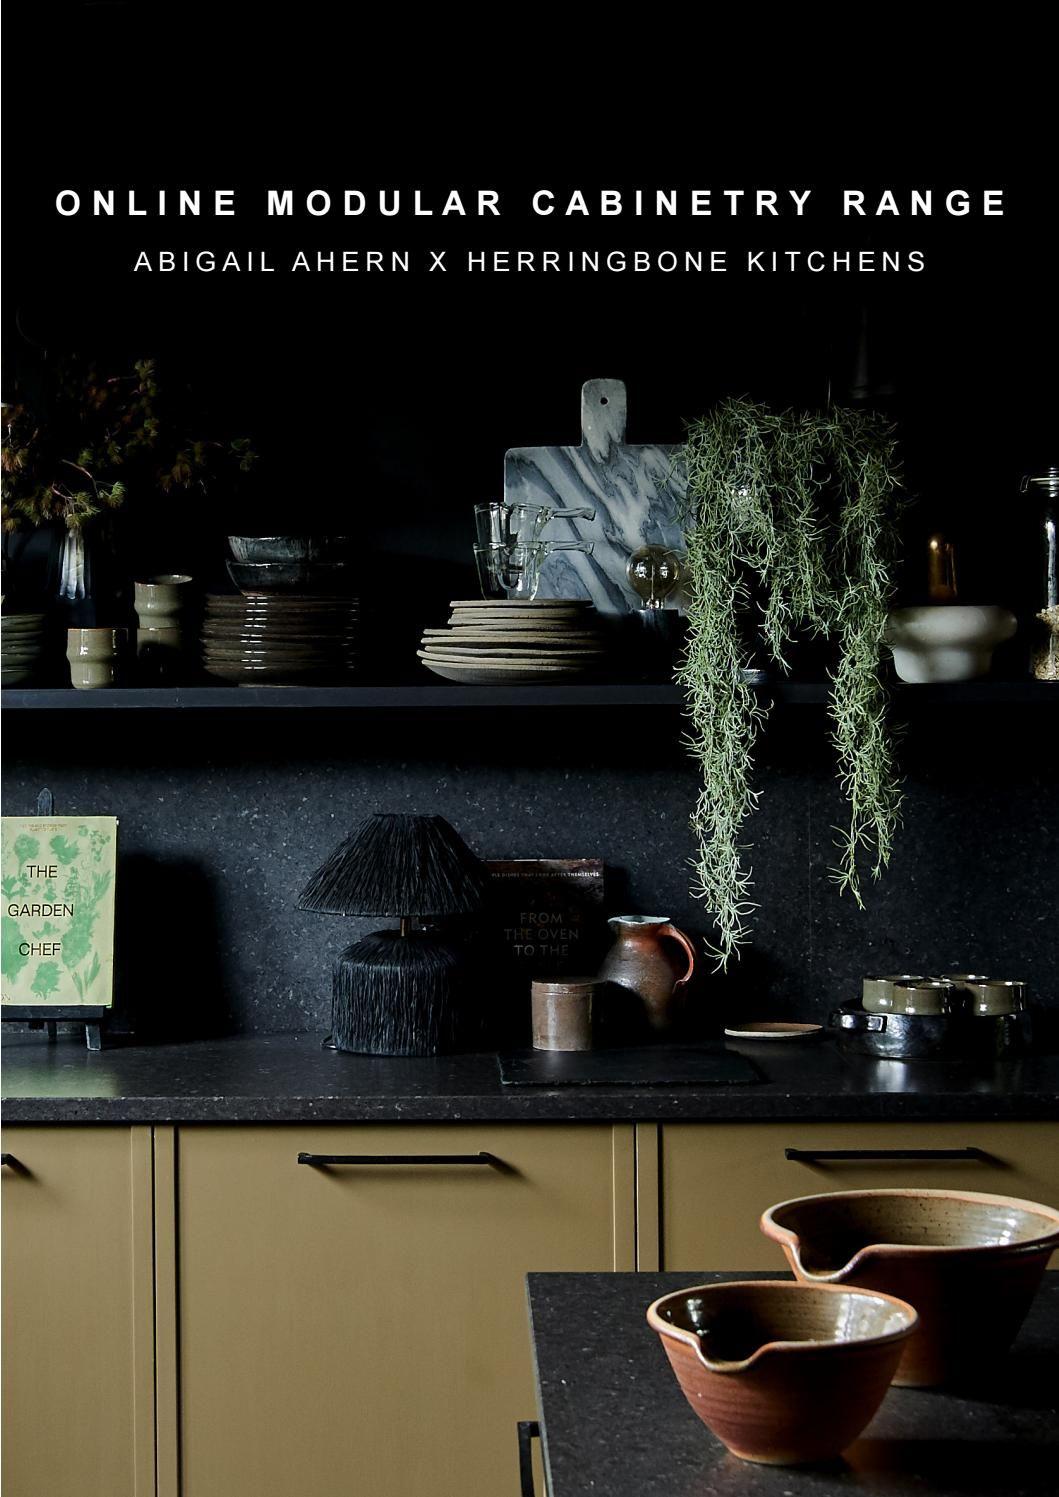 Best Abigail Ahern X Herringbone Kitchens Online Modular 640 x 480